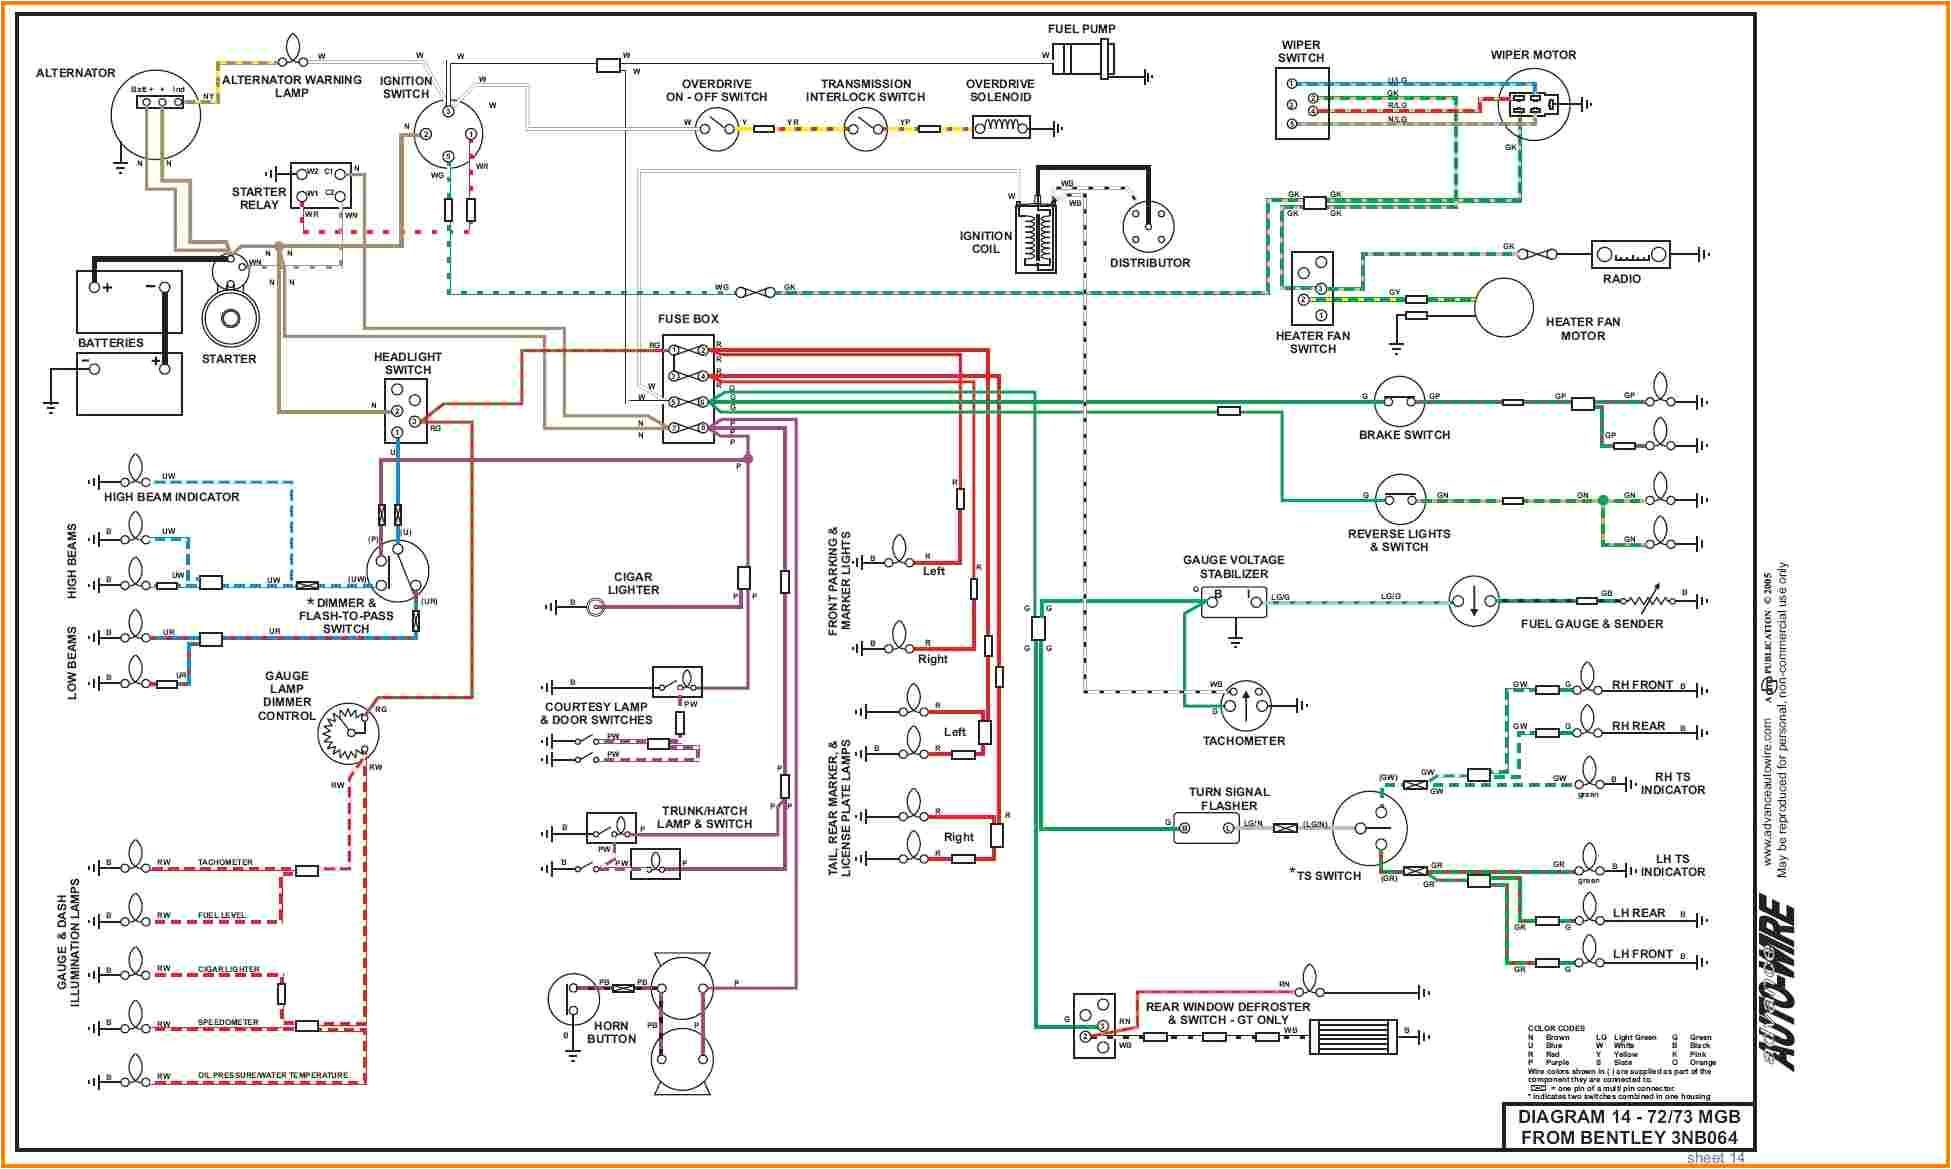 1968 mgb wiring diagram wiring diagram user 1968 mgb wiring diagram wiring diagrams 1968 mgb gt